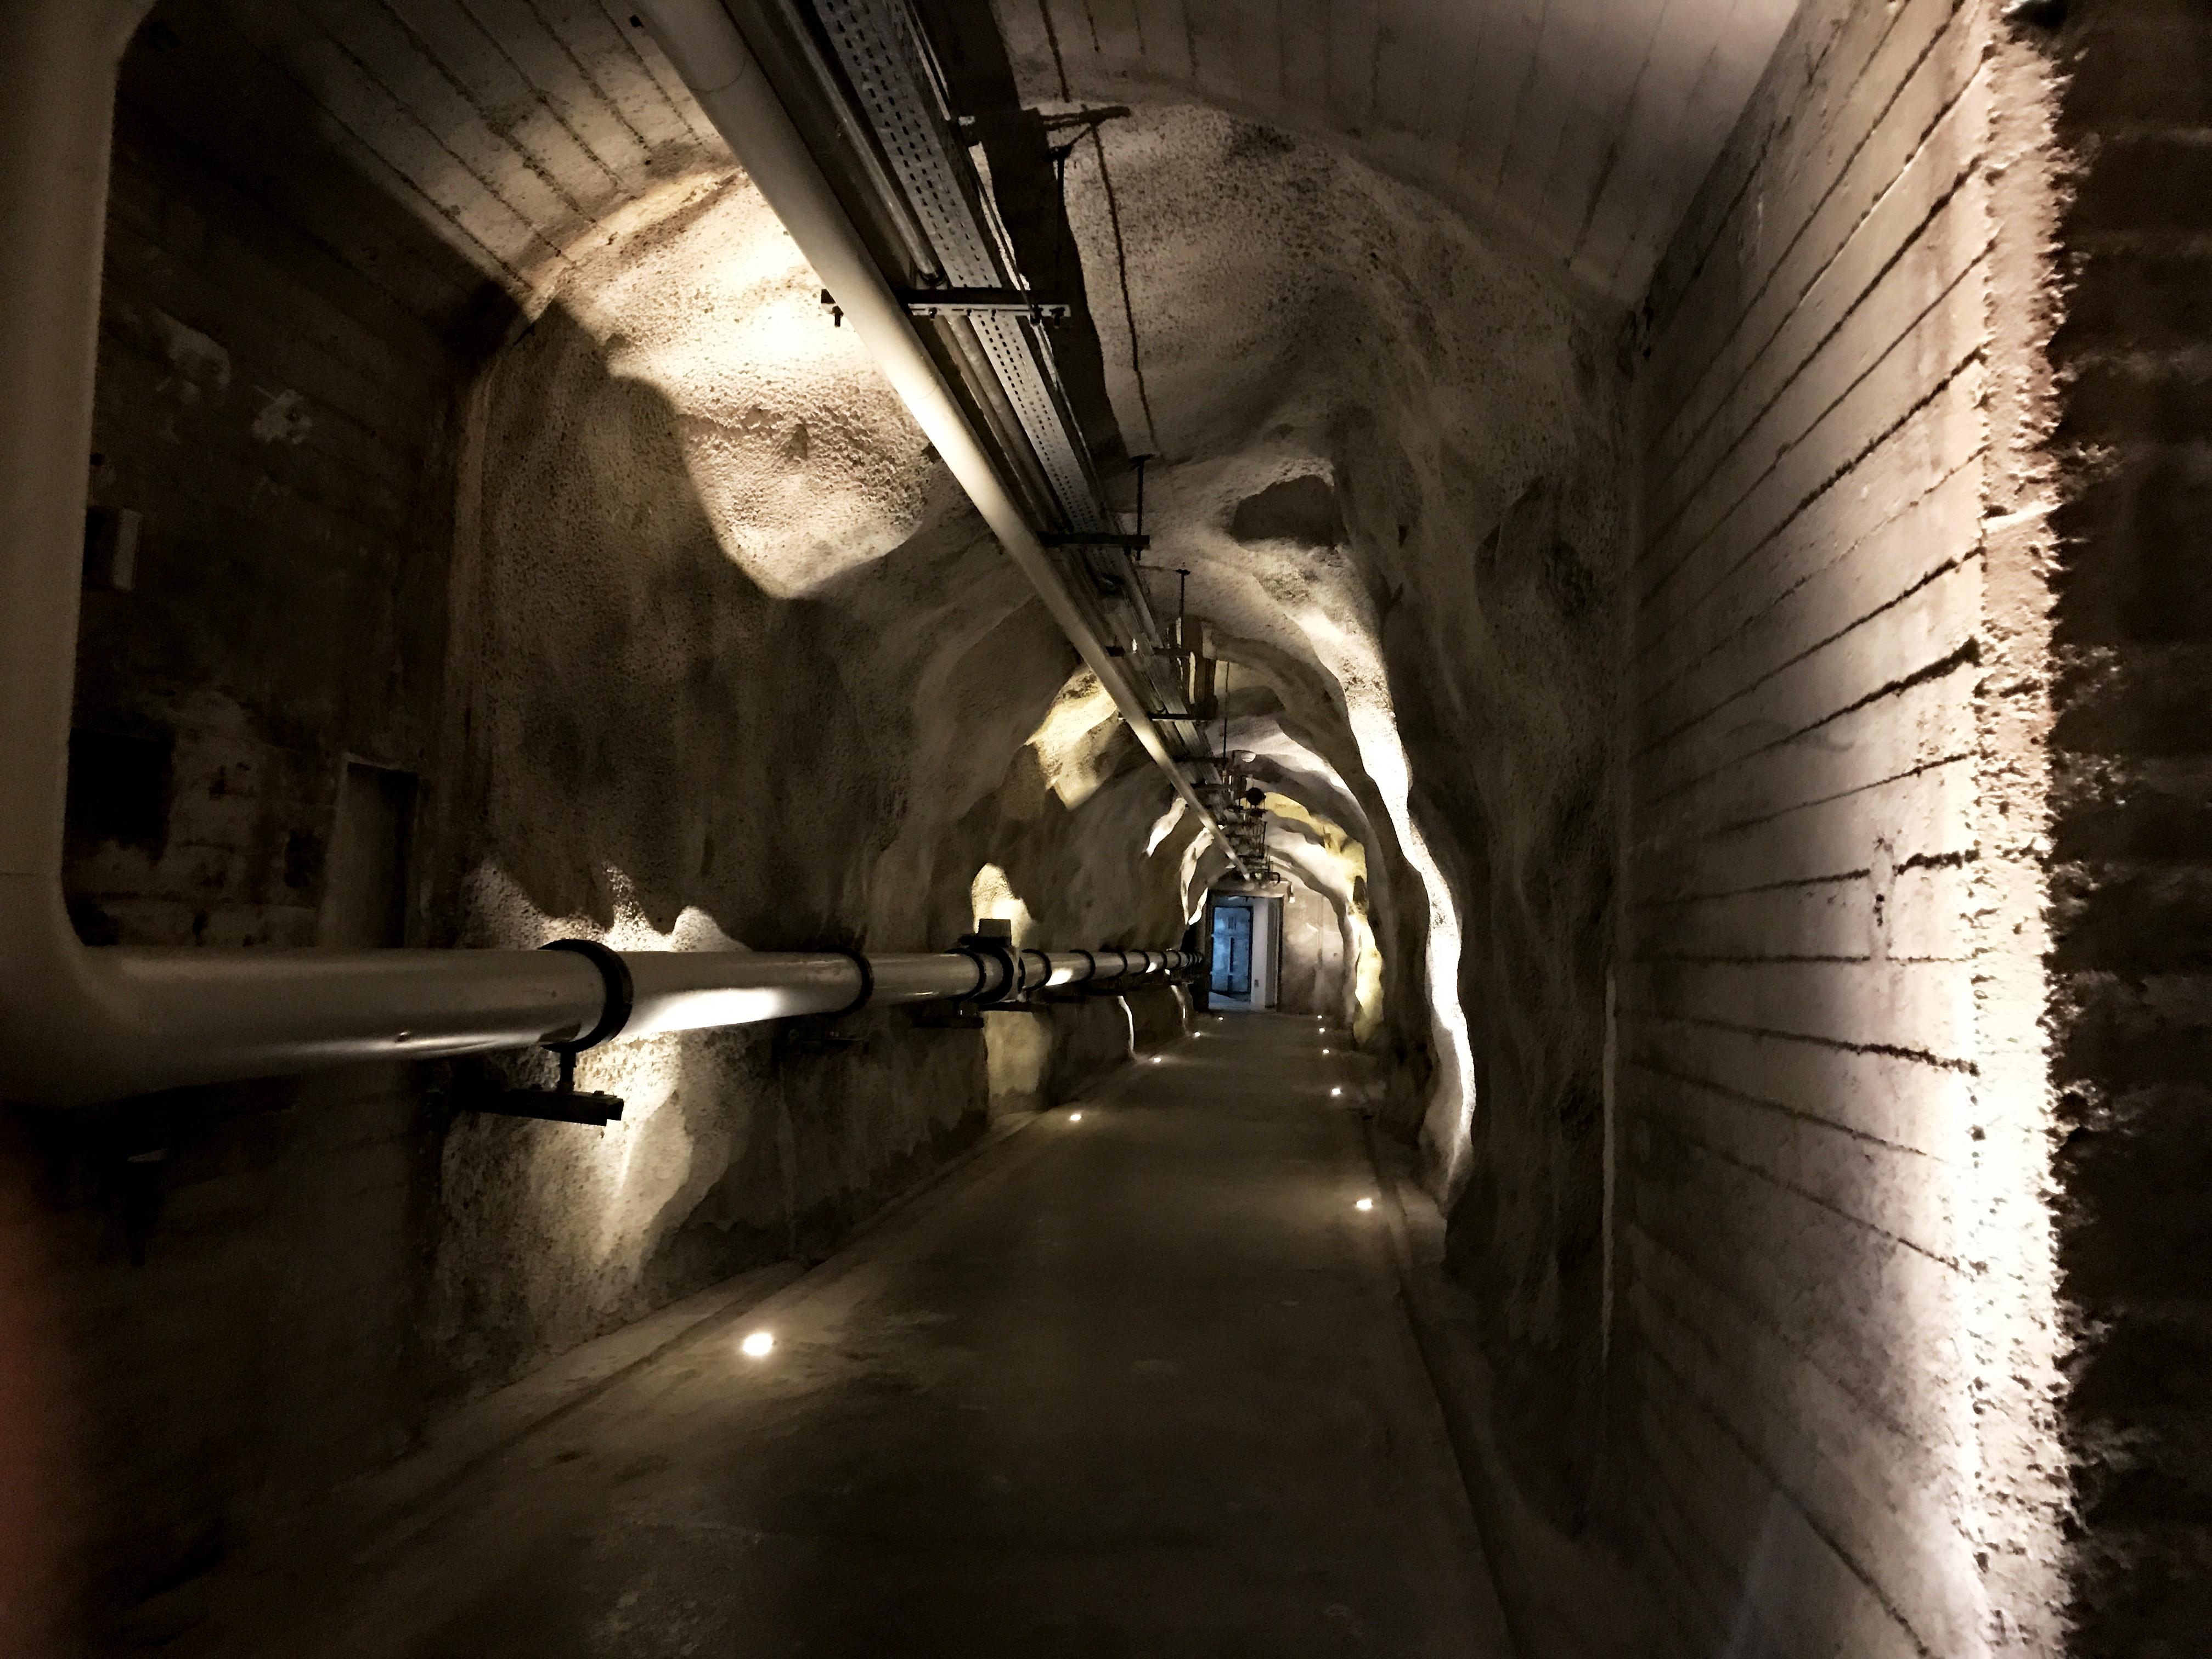 A passageway through the granite mountain.